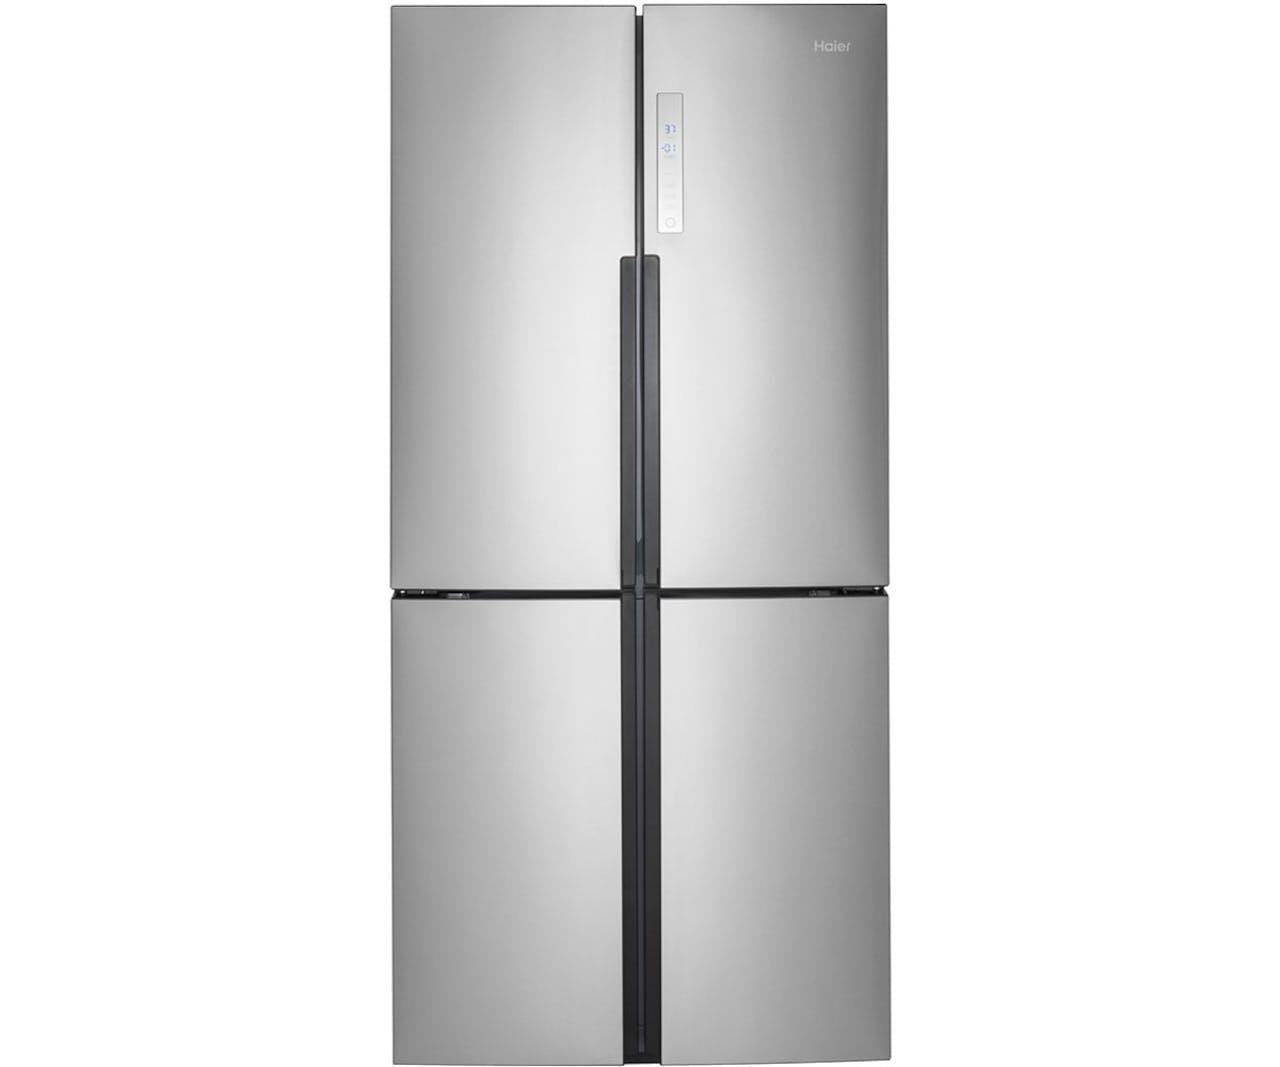 Haier Quad Door Refrigerators